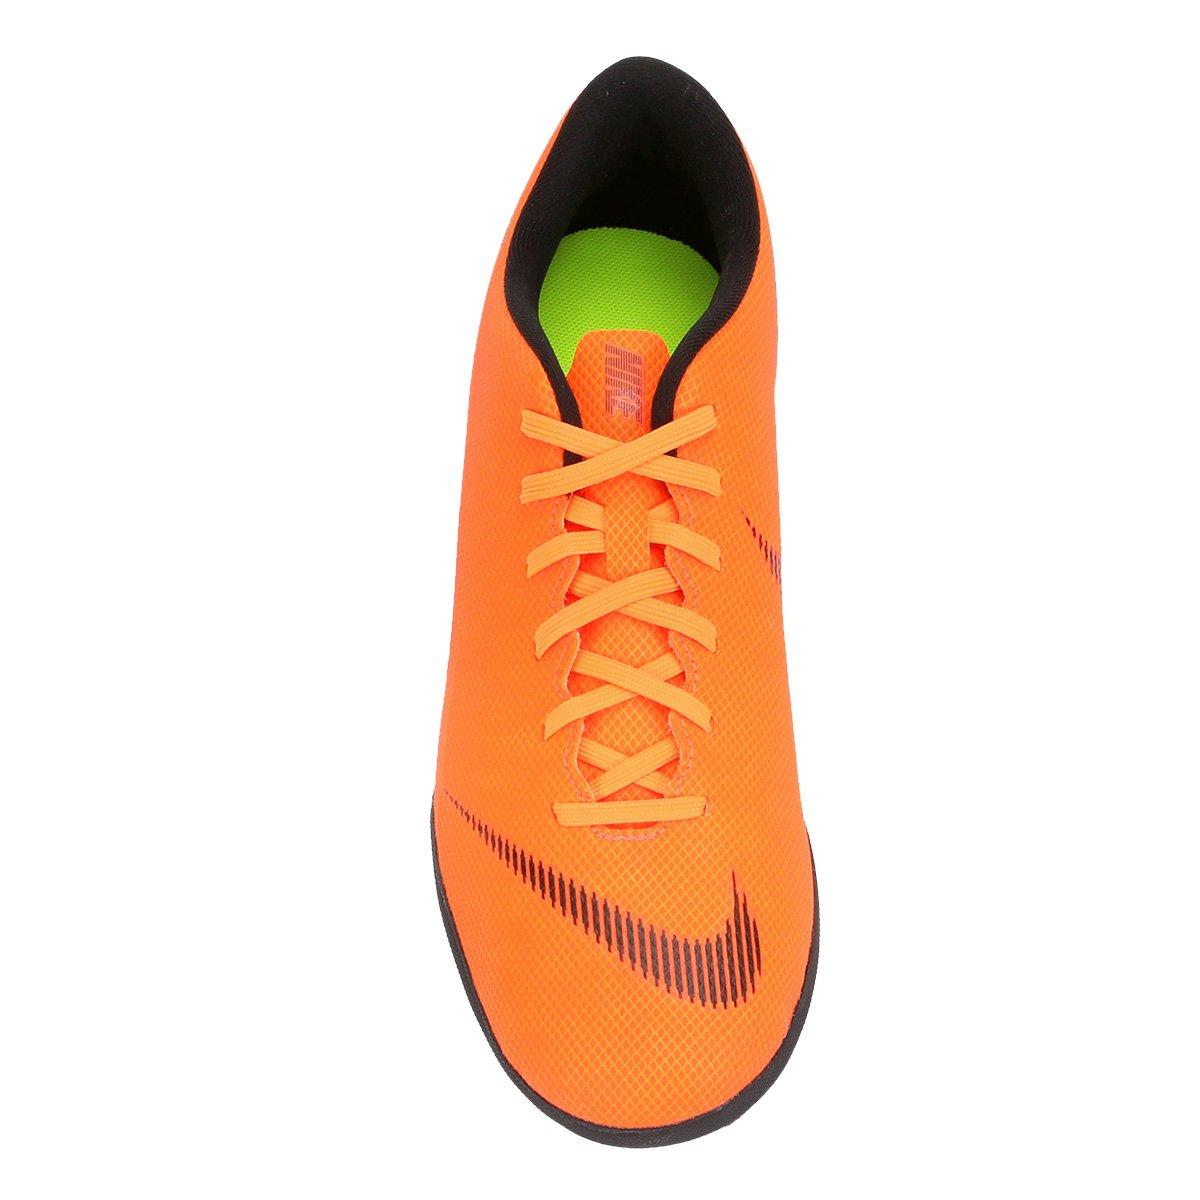 7f5041ab0e Chuteira Nike Society Mercurial Vapor 12 Club - Laranja e Preto ...